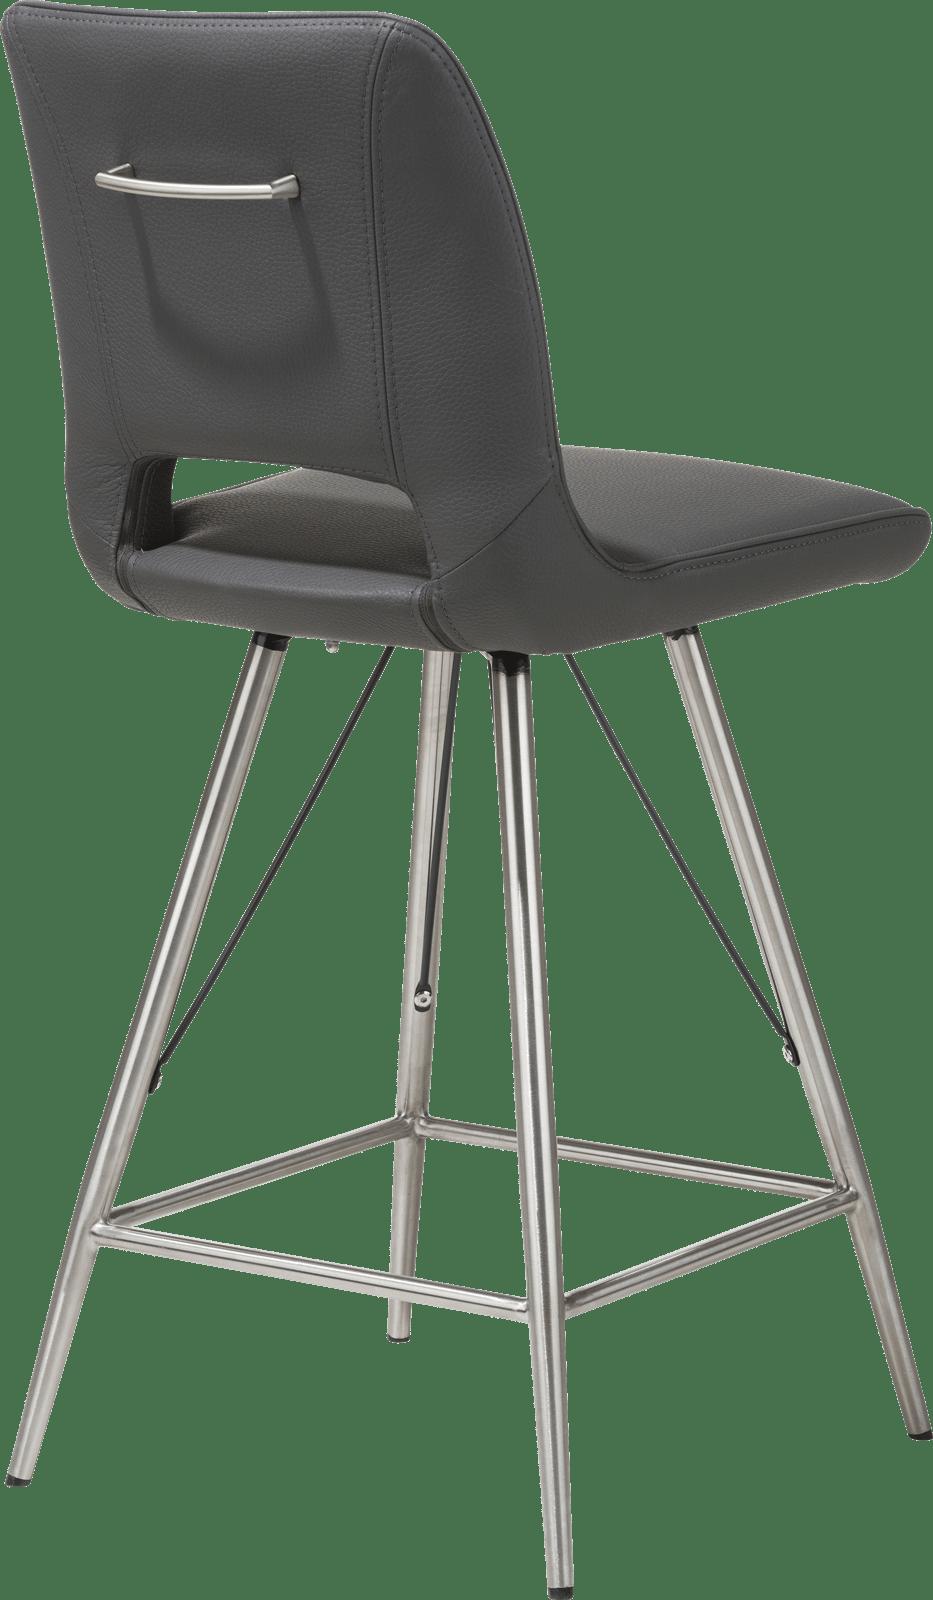 Ou Antracite CharcoalAccent Duncan Tatra Chaise Bar De Inox nOk0wPX8